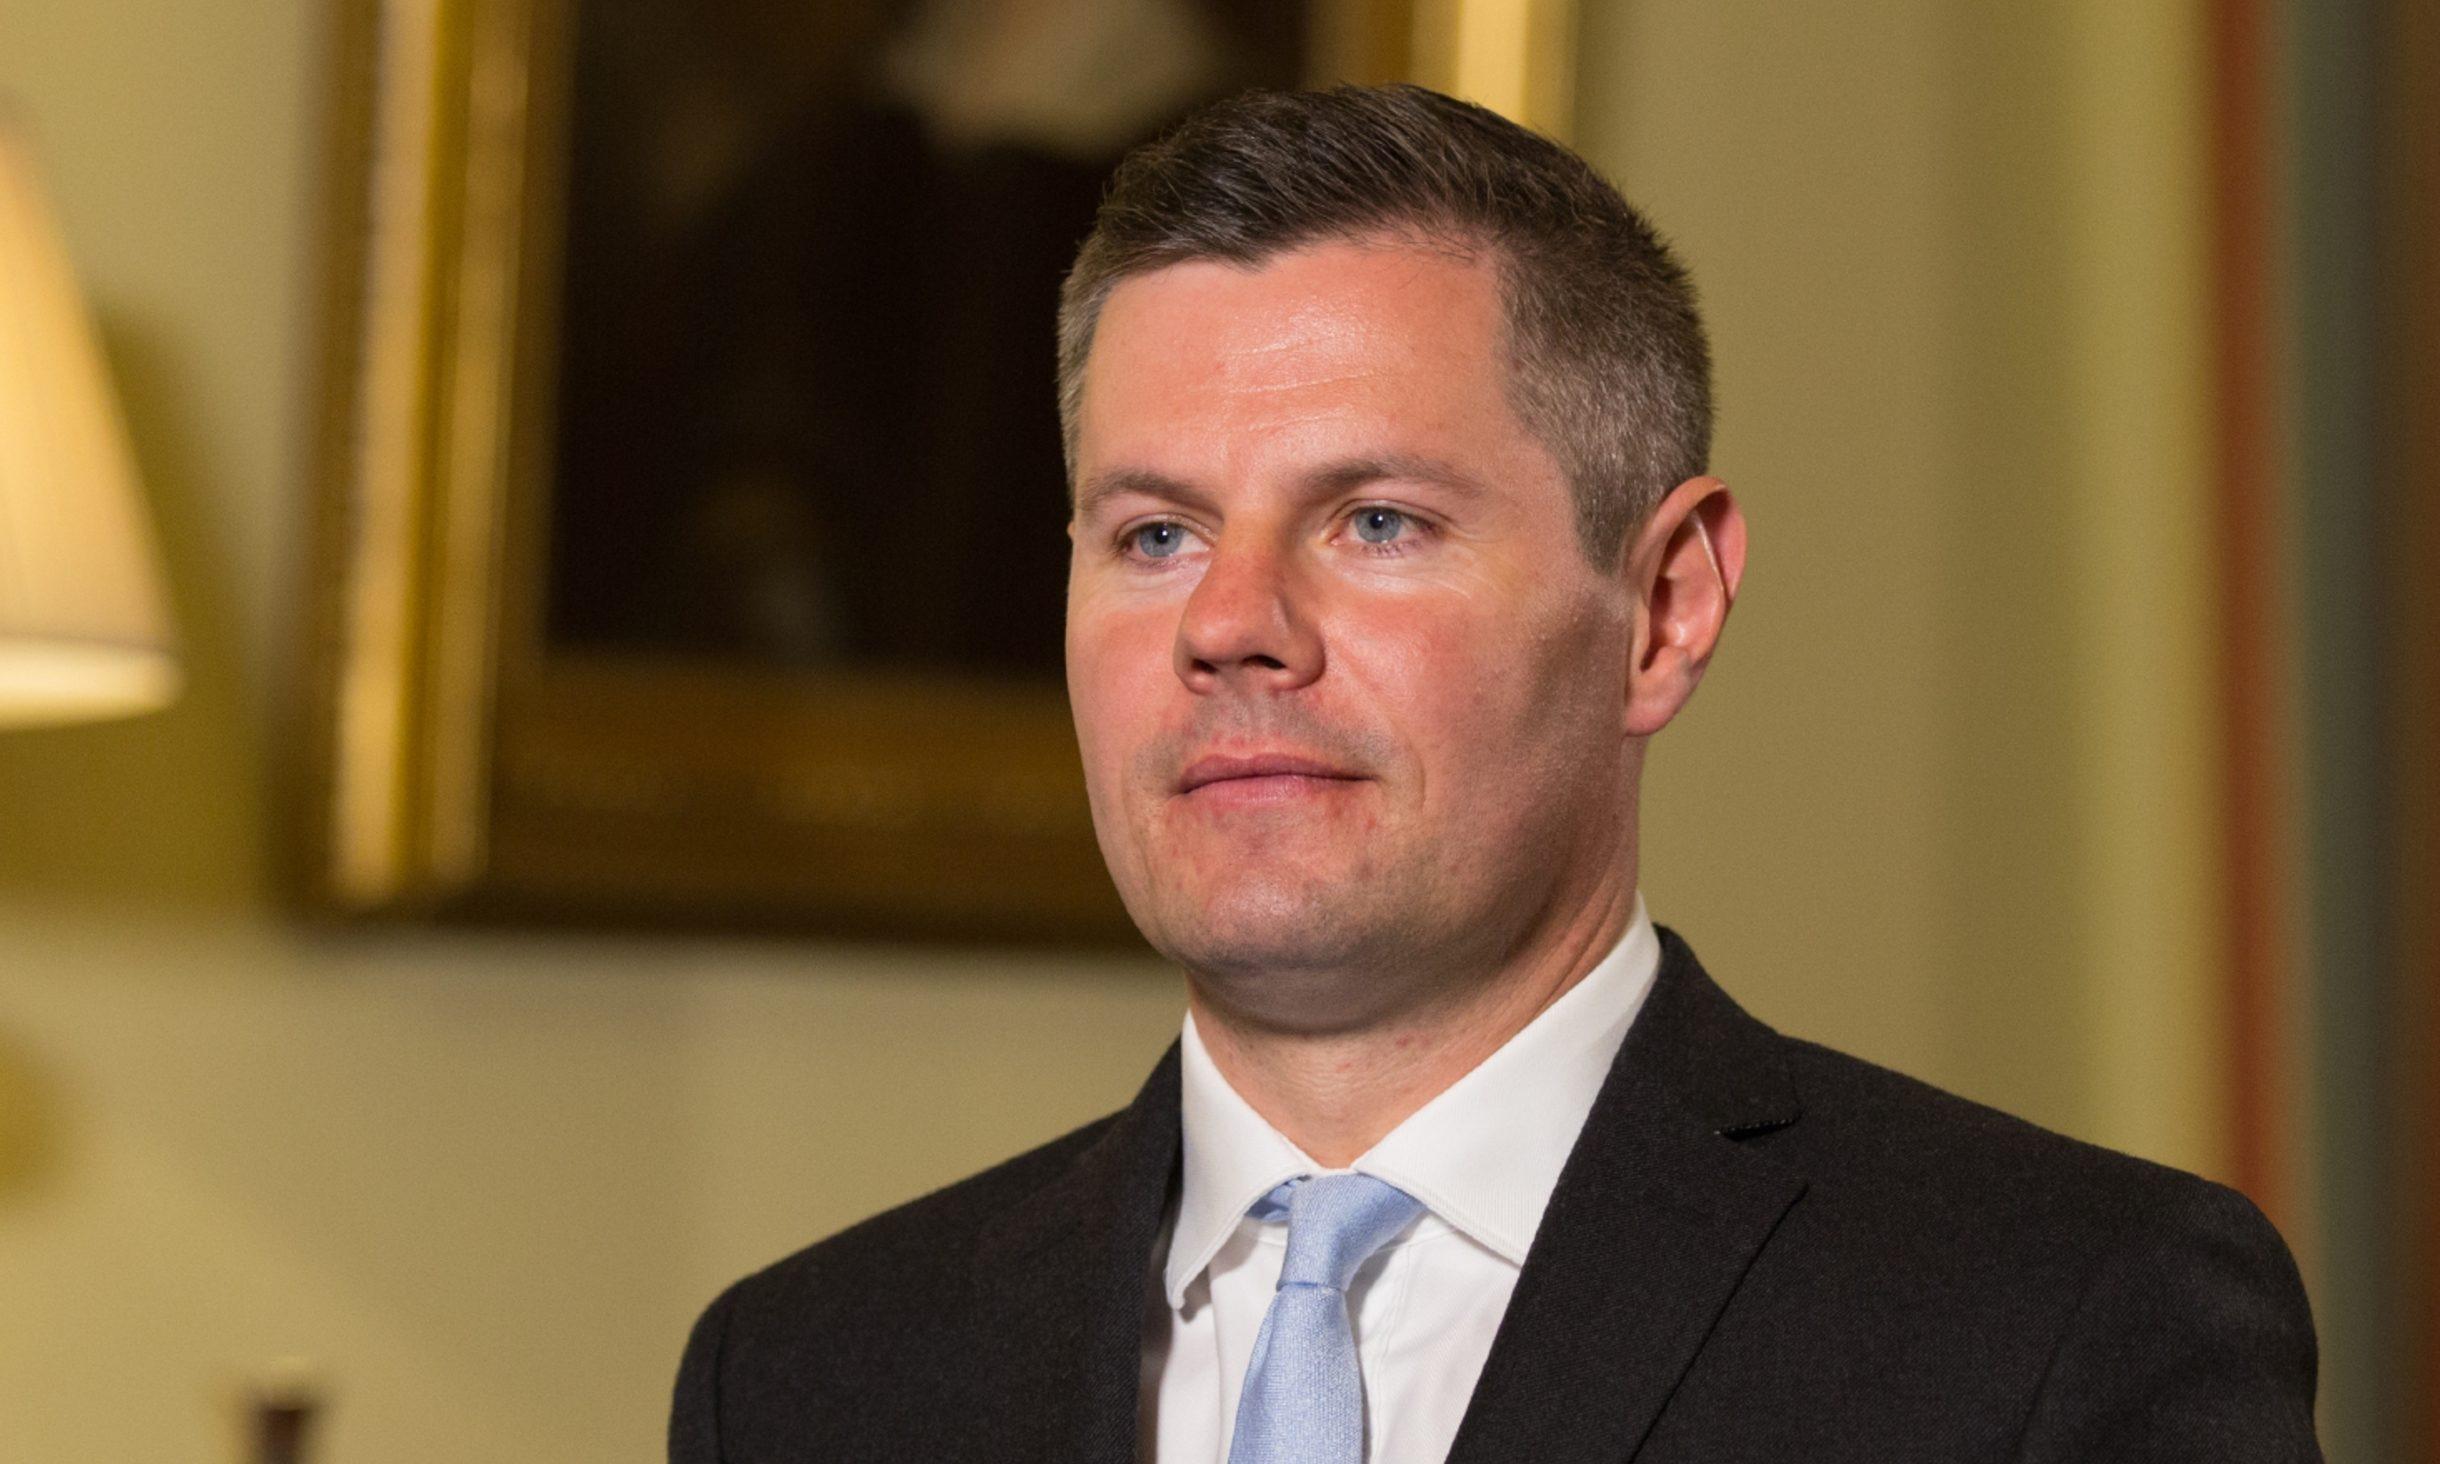 Derek Mackay, cabinet secretary for Finance